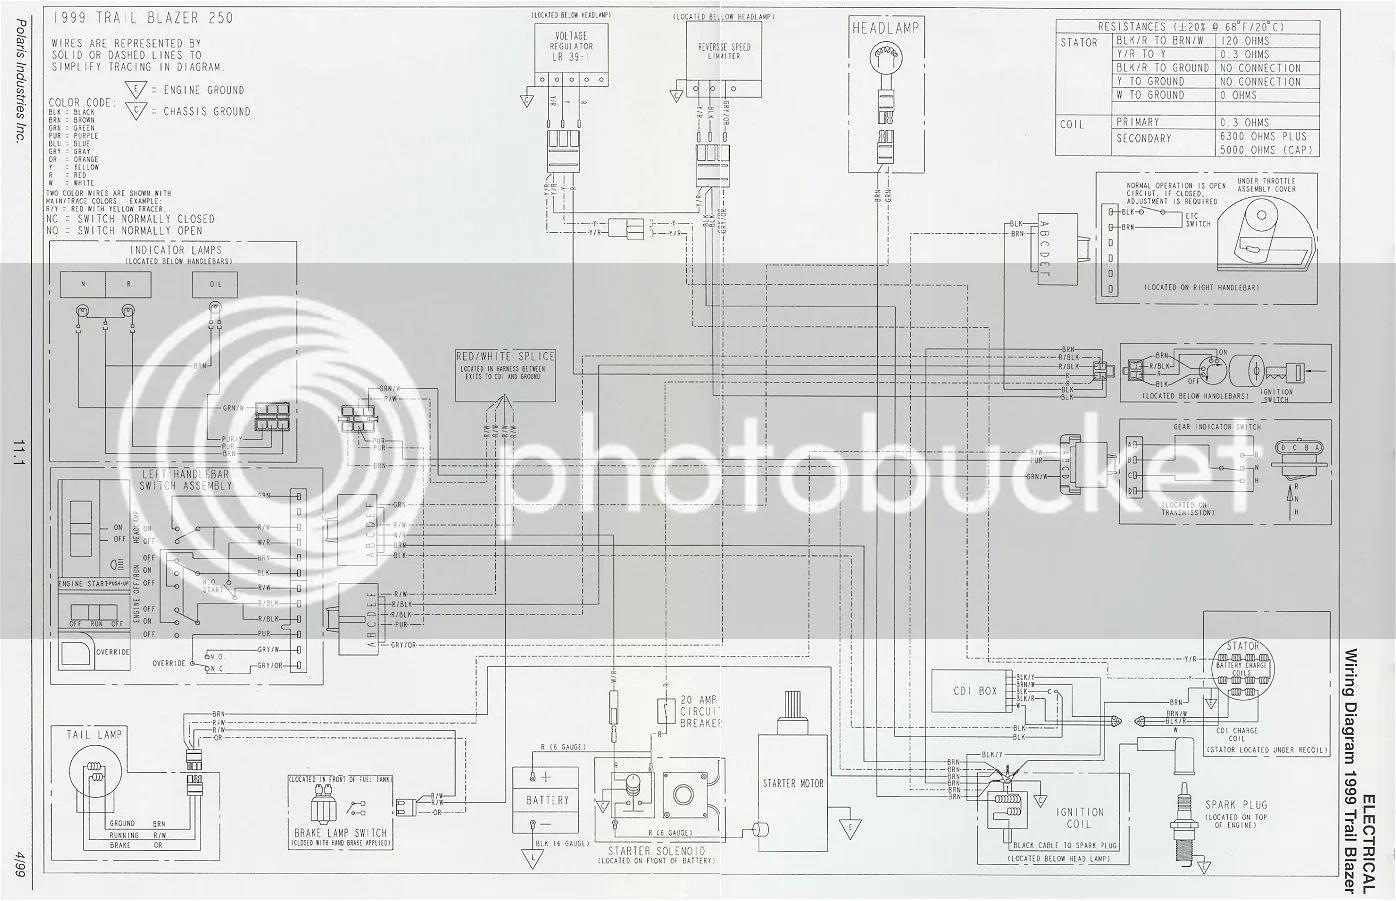 Polaris Atv Parts 1992 W927527 Trail Boss 2x4 Wiring Harness Diagram